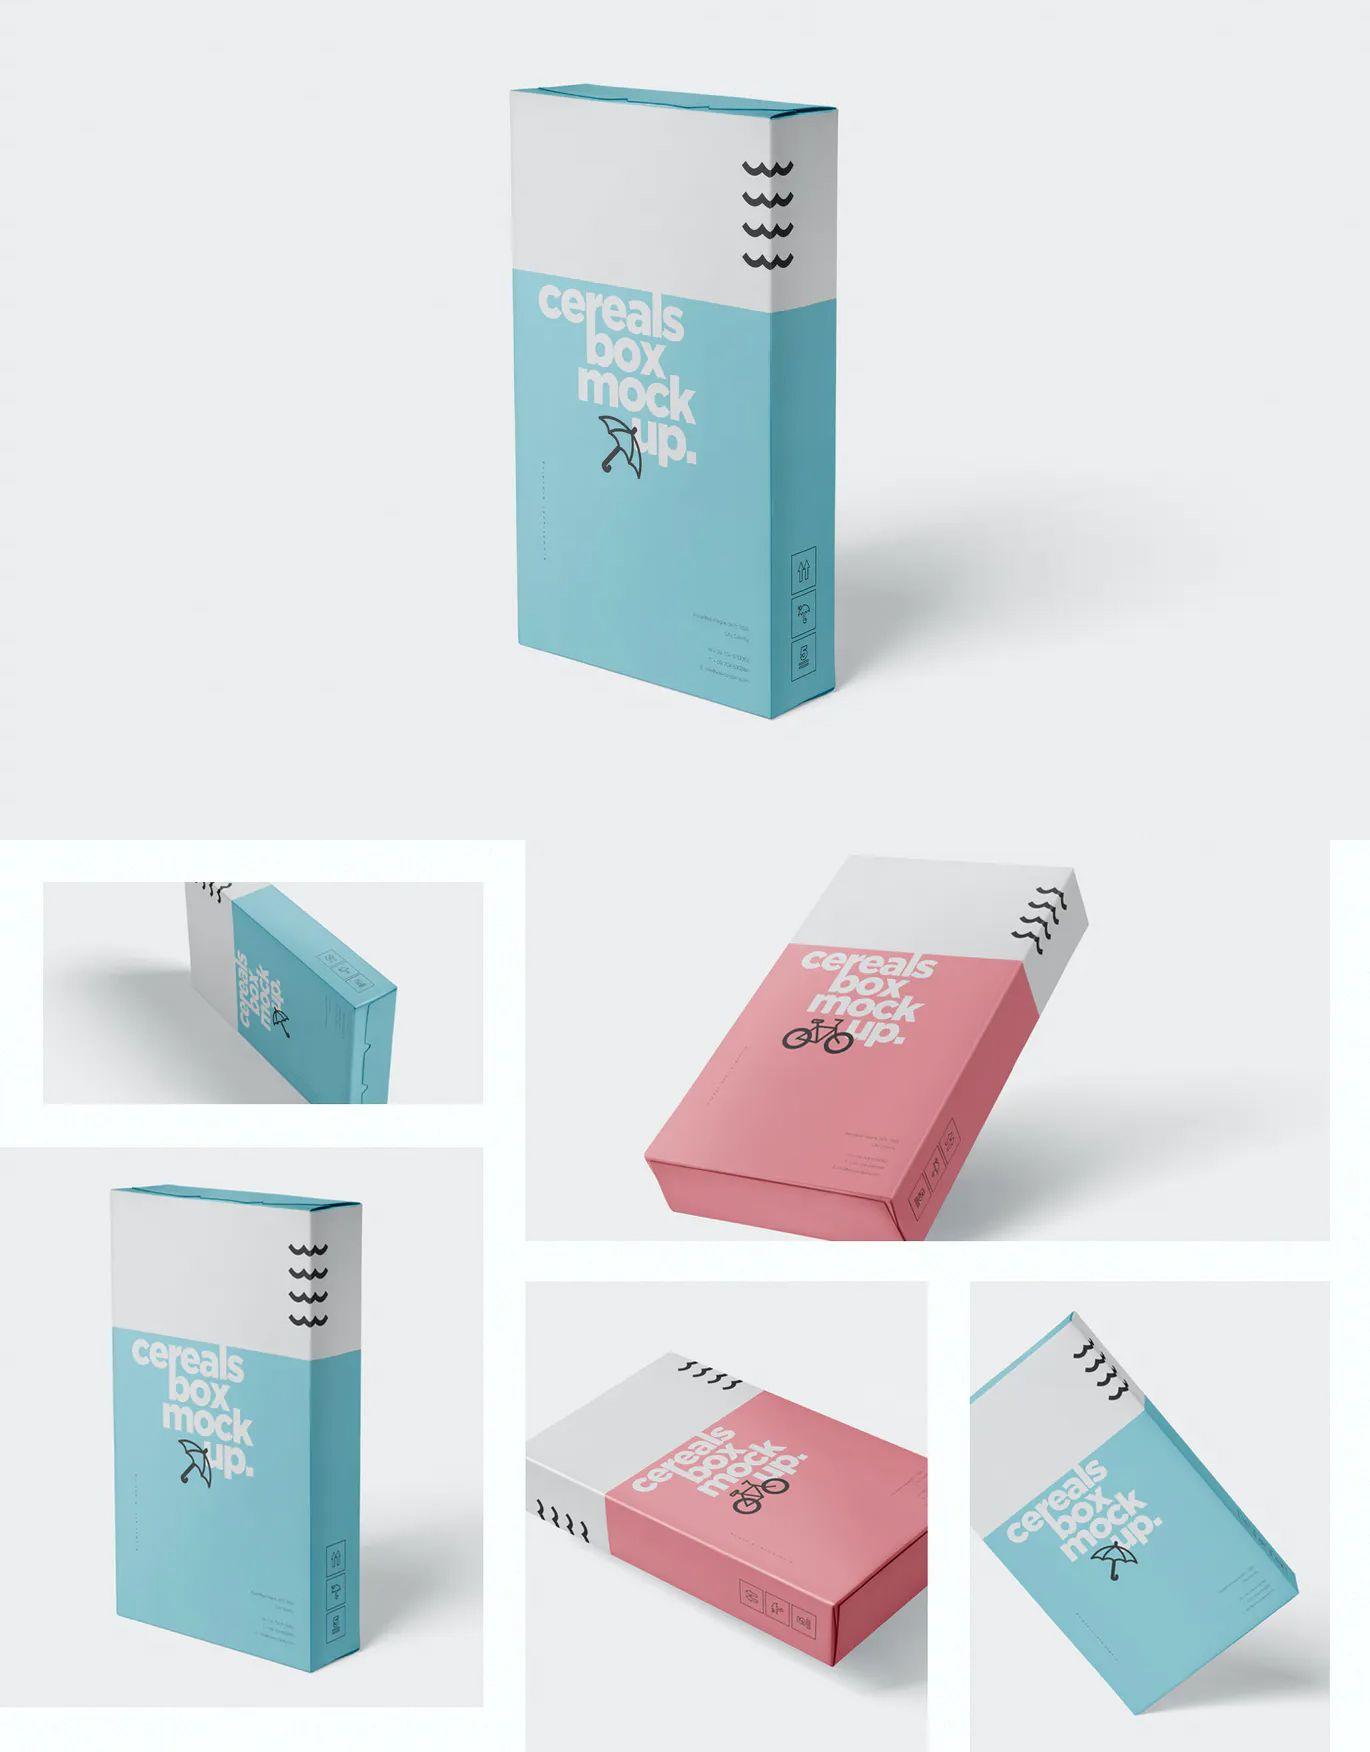 Cereals Box Mockup Slim Size Box By Gfxfoundry On Envato Elements Box Mockup Cereal Box Mockup